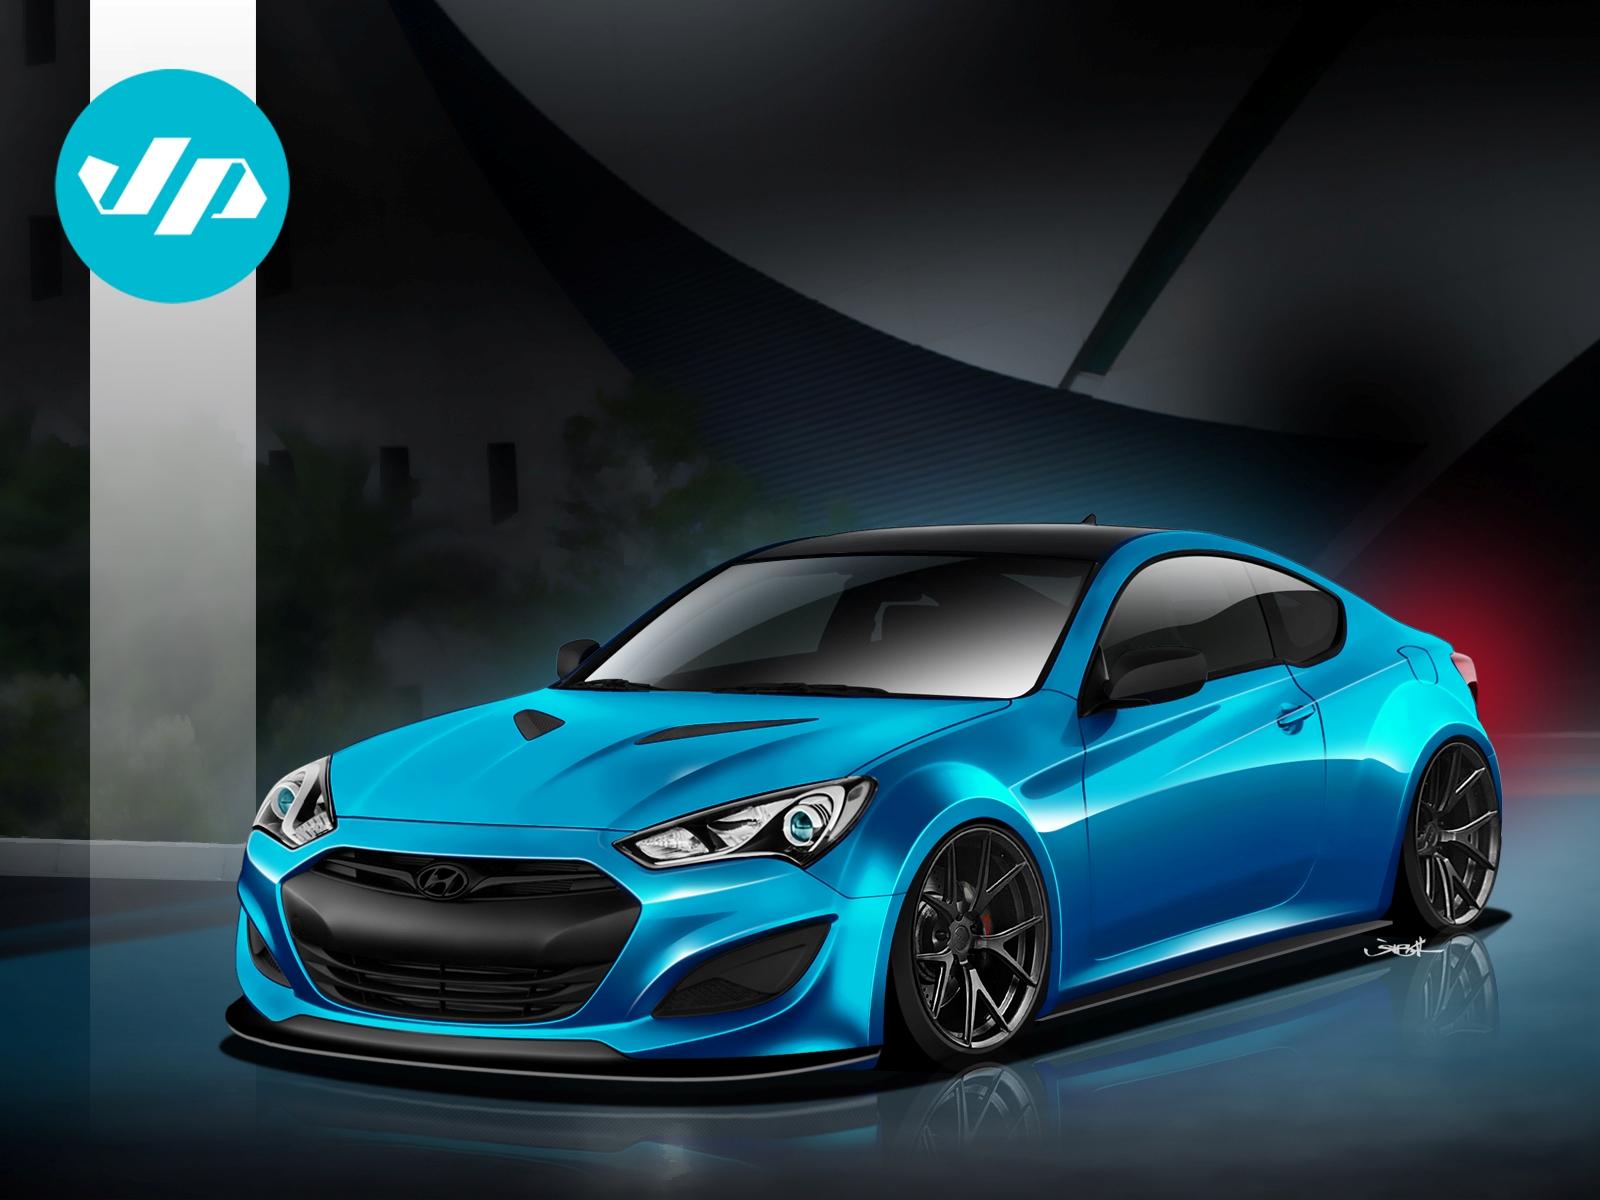 Hyundai JP Genesis Coupe